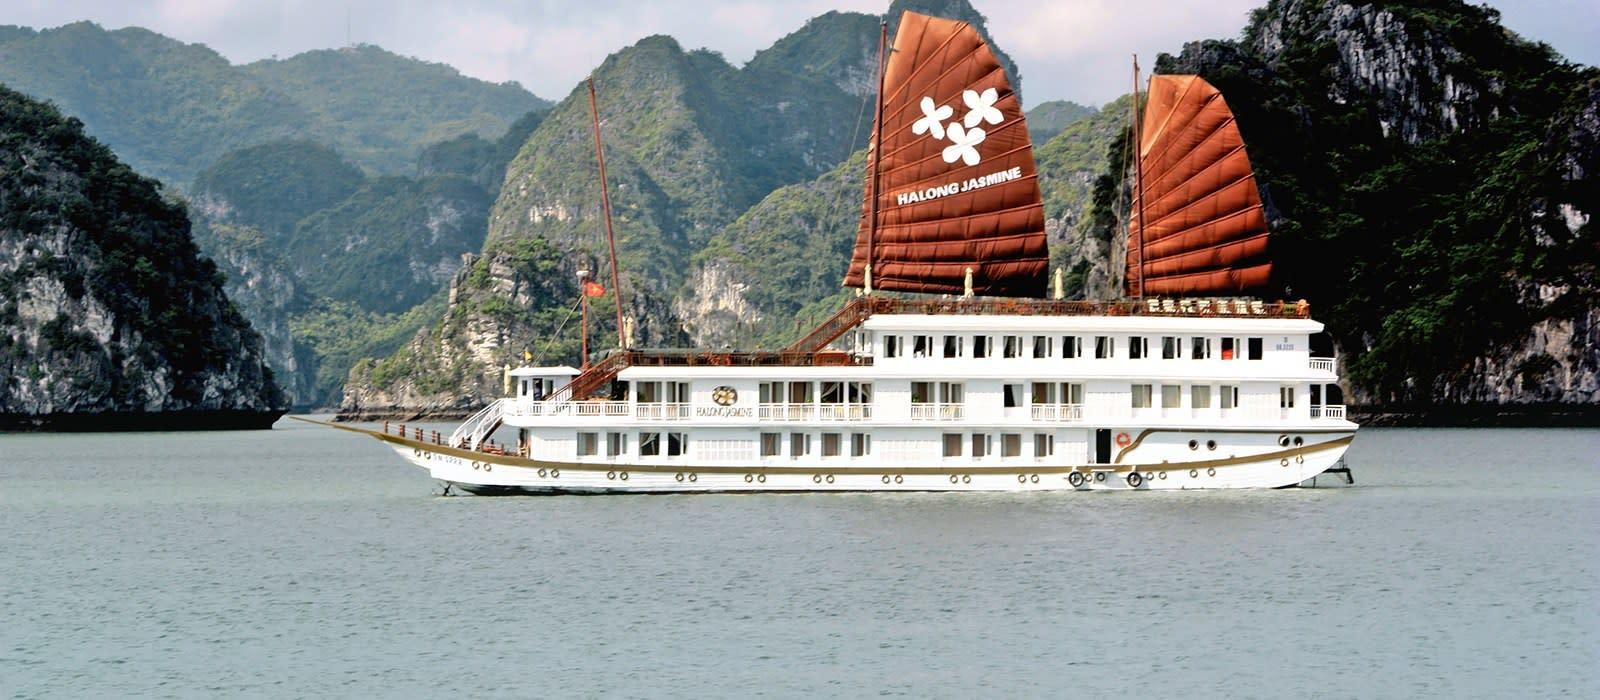 Hotel Halong Jasmine Cruise Vietnam